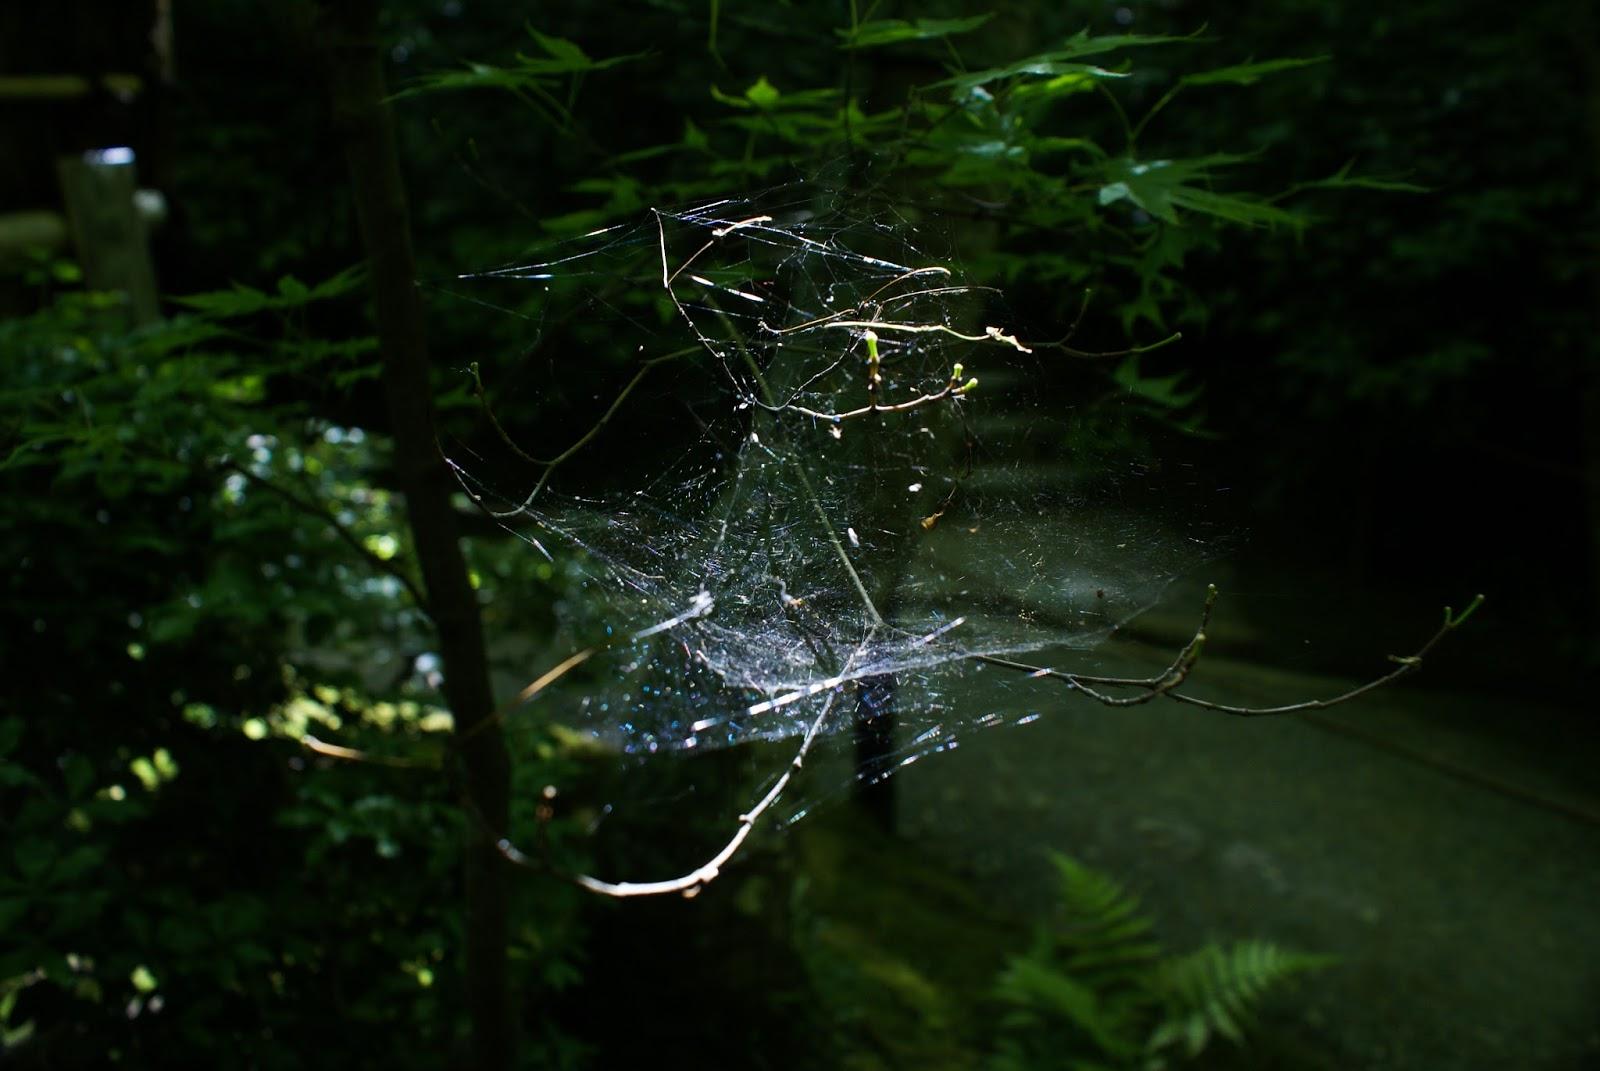 arashiyama kyoto japan gioji spring spiderweb